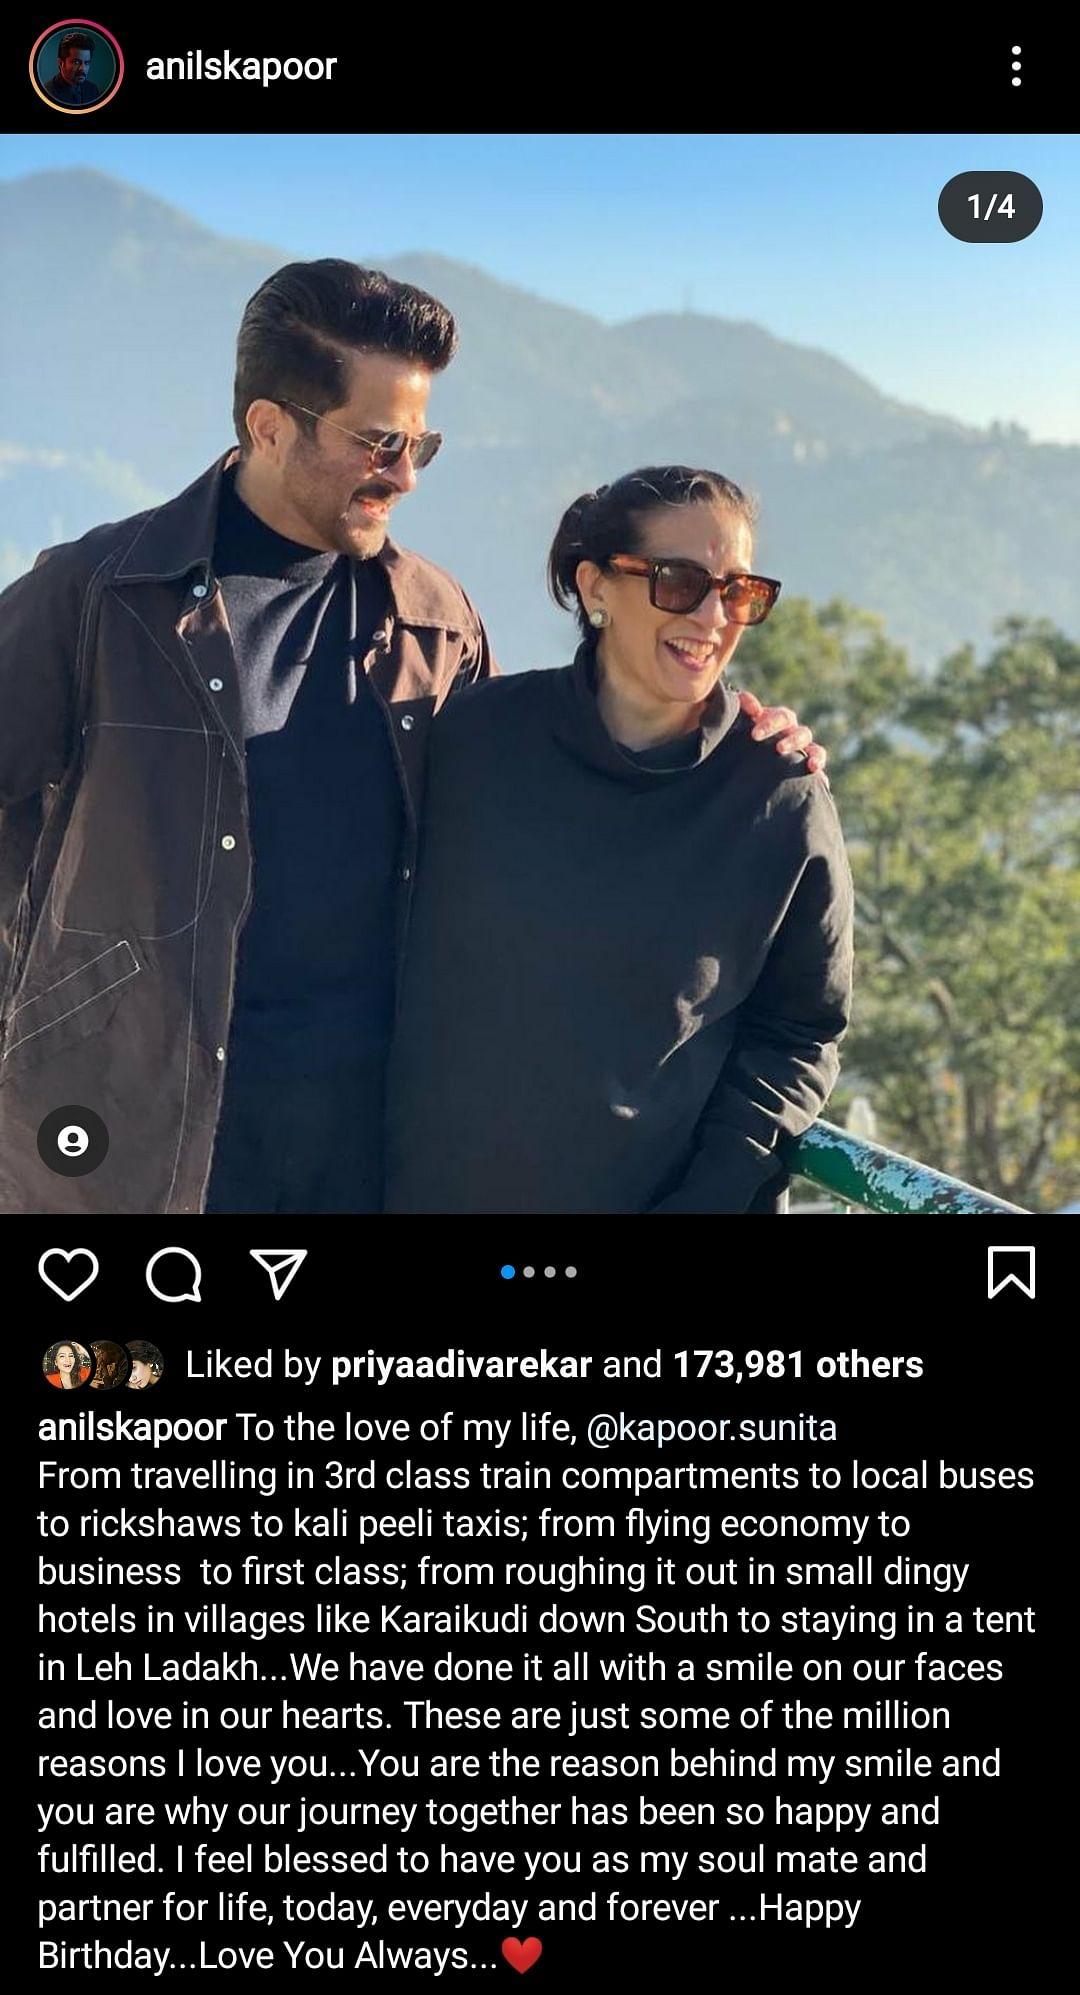 Anil Kapoor, Sonam and Rhea Wish Sunita Kapoor on Her Birthday